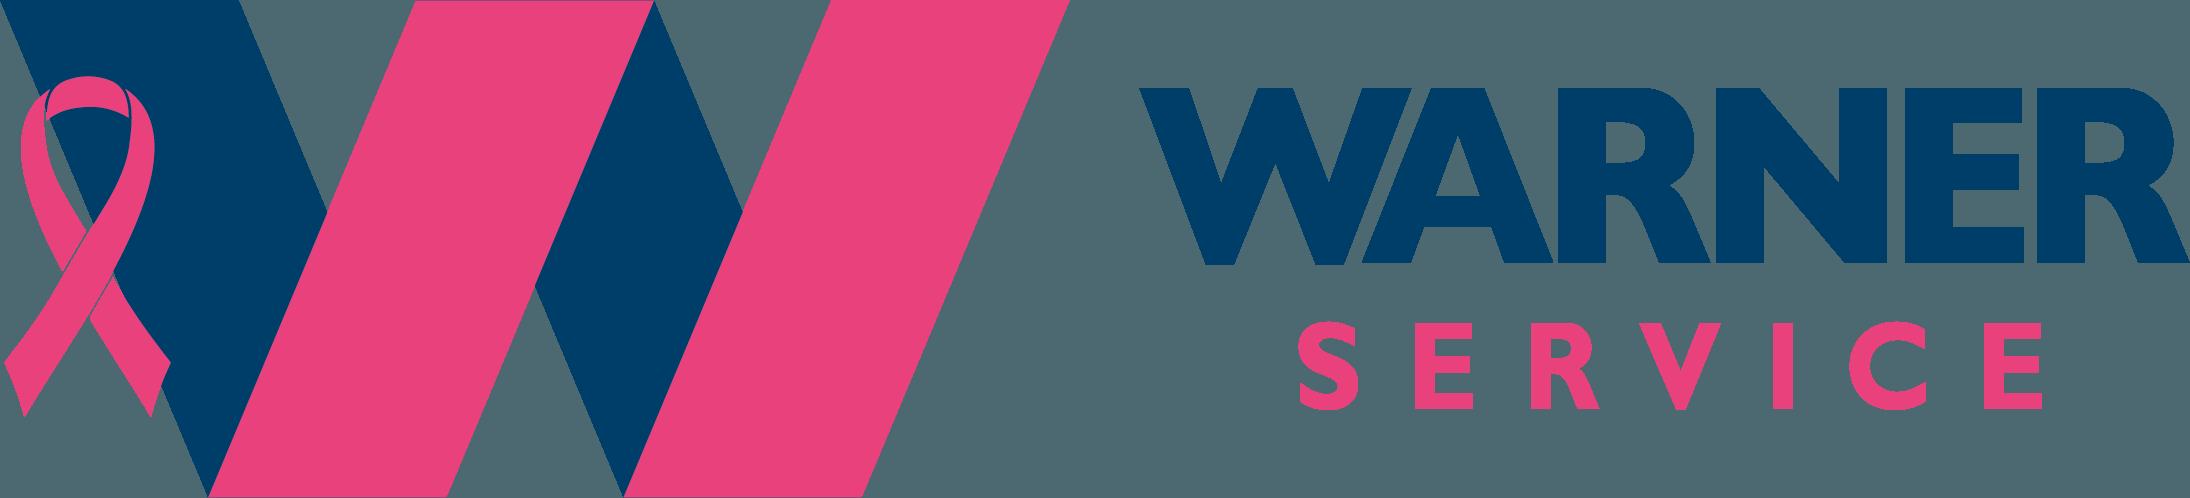 warner-service-breast-cancer-awarness-logo (1)